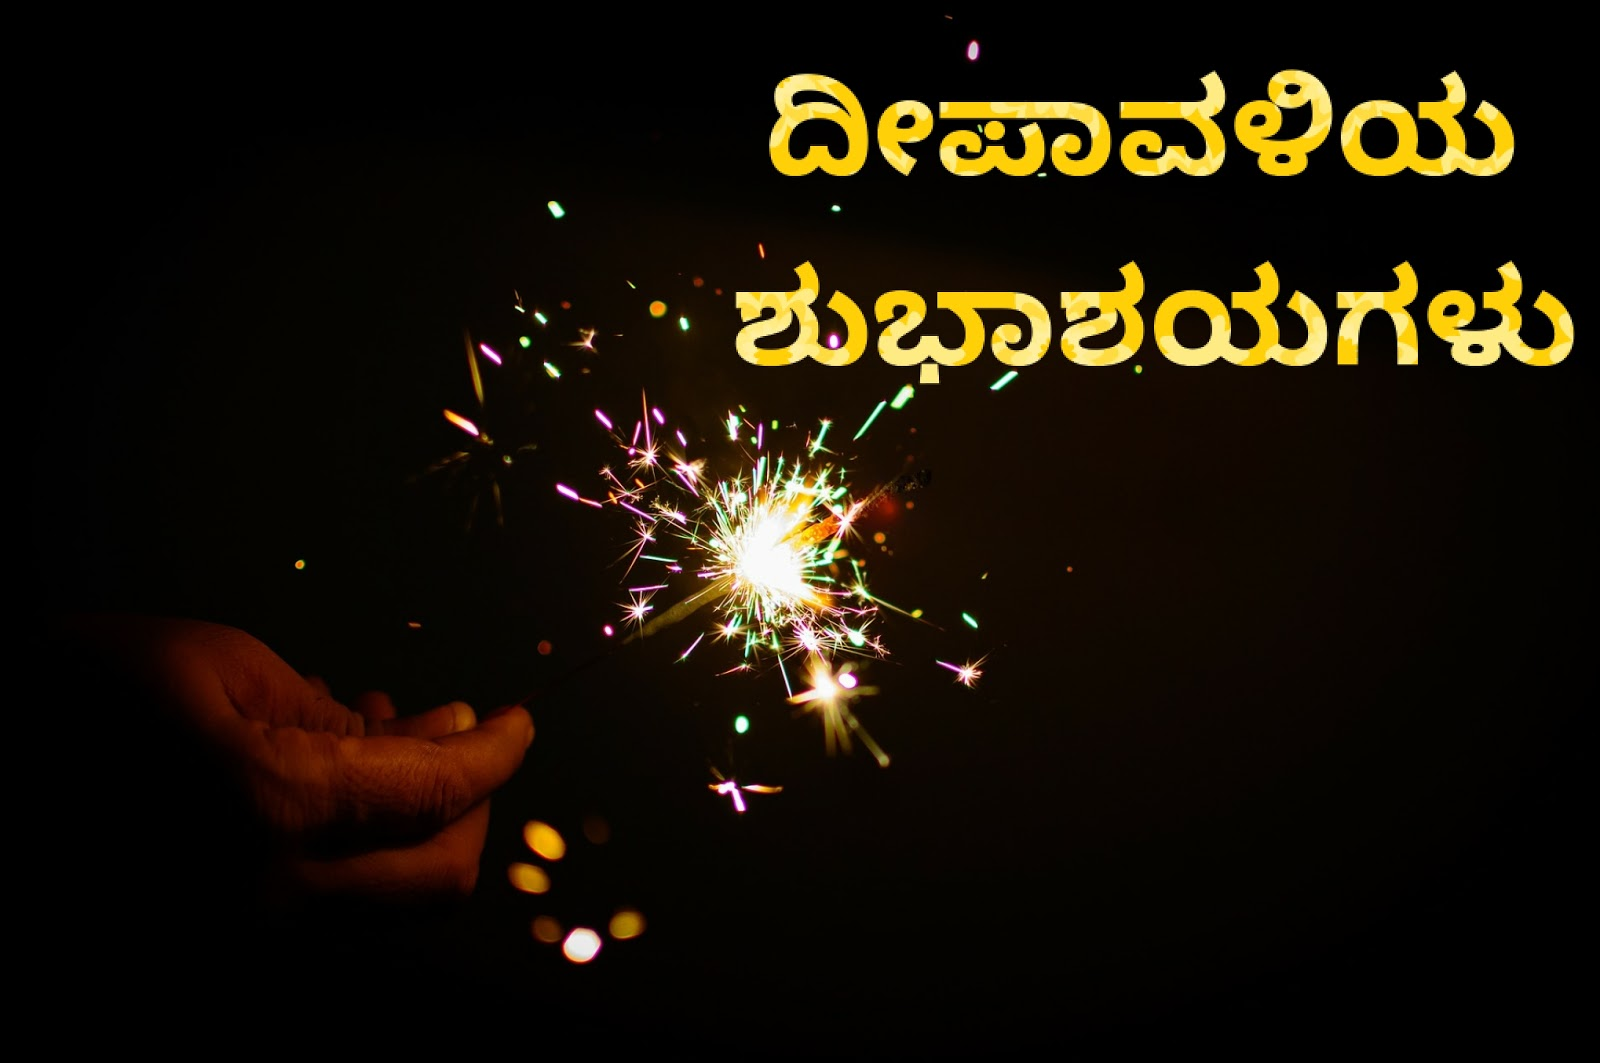 Happy diwali greetings in kannada 2018 free download hd happy diwali greetings in kannada 2018 free download hd m4hsunfo